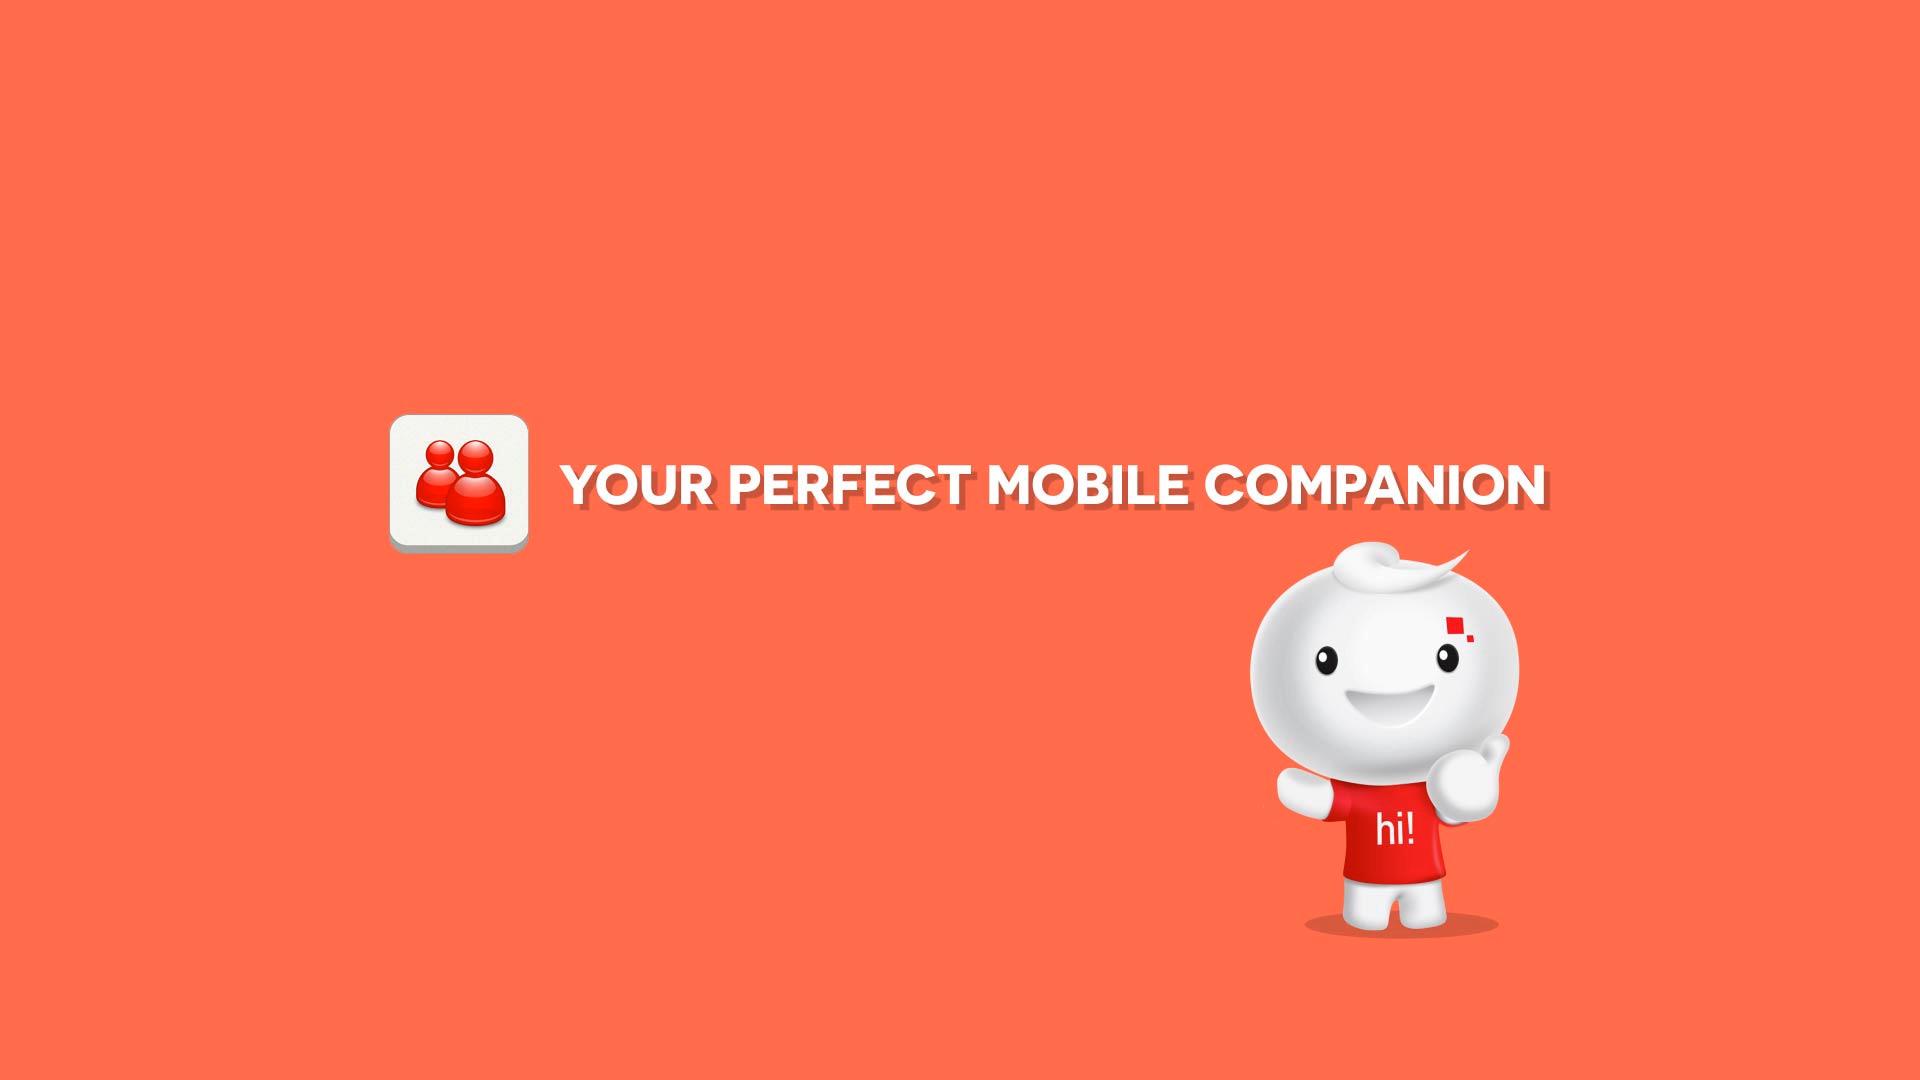 Singtel Prepaid App._Ver2_101114 (0-01-28-15) - Copy